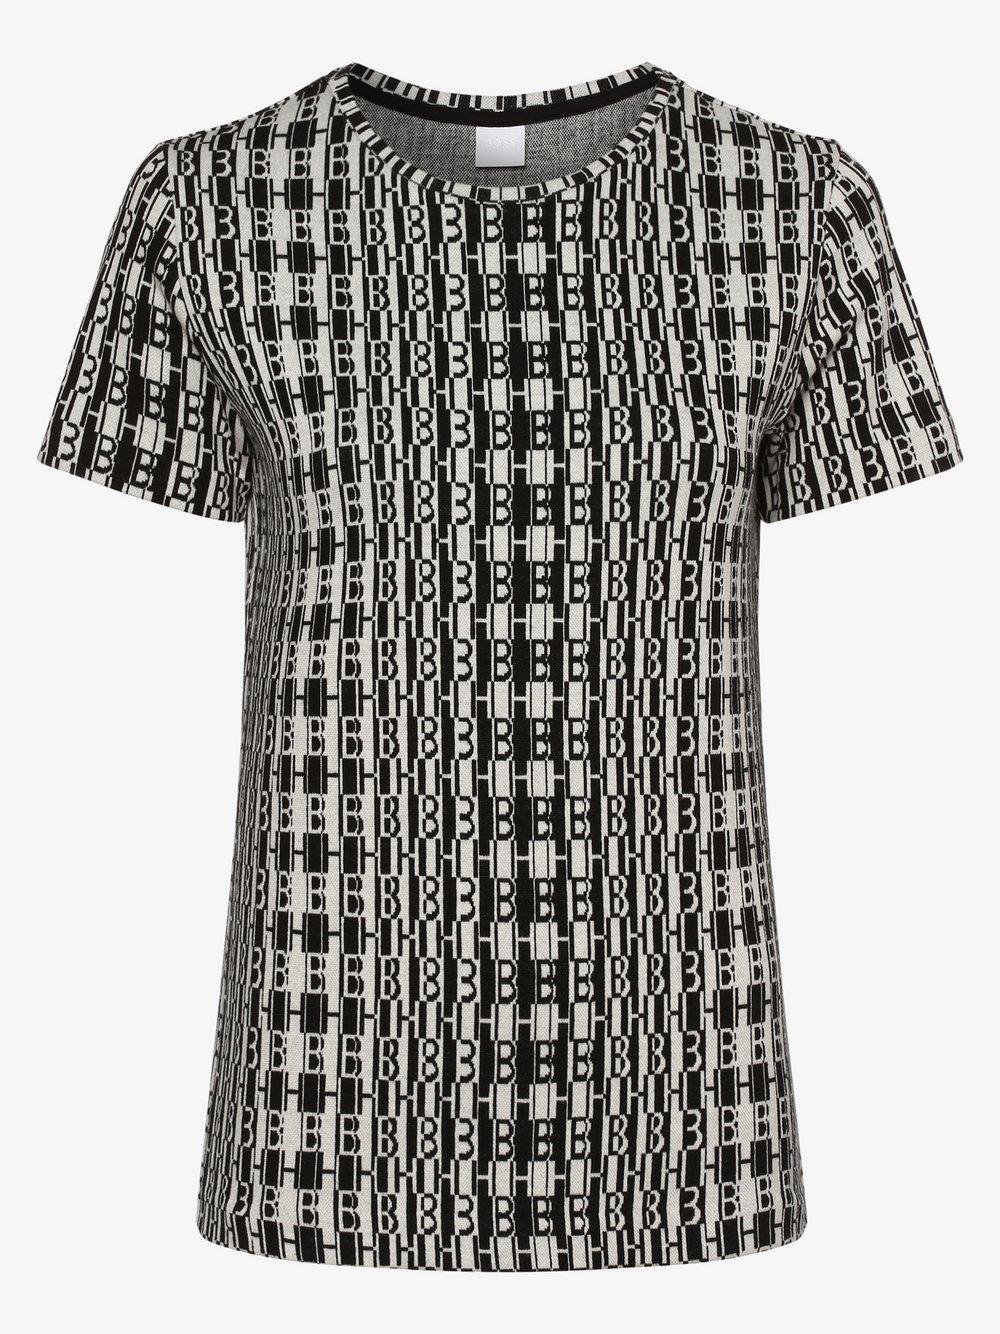 BOSS Casual – Koszulka damska – Tafil, czarny Van Graaf 461097-0001-09970